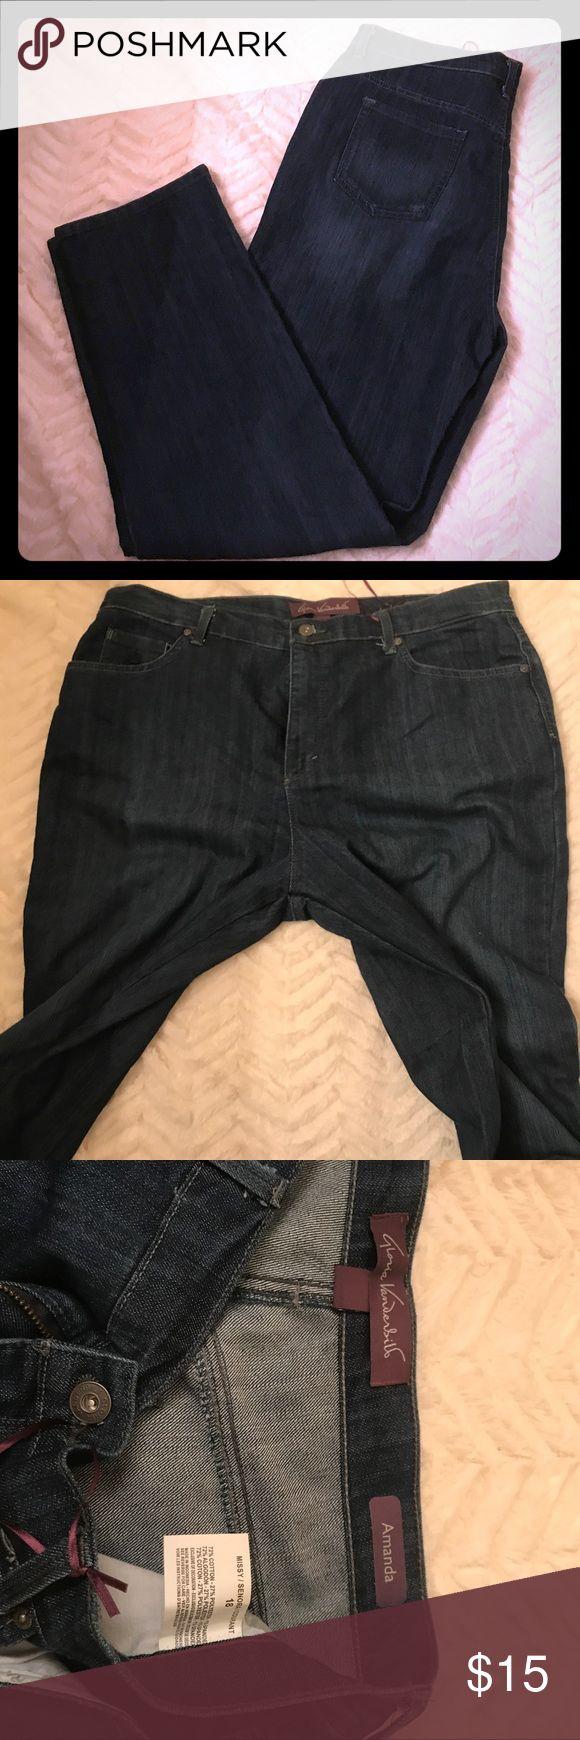 Gloria Vanderbilt Amanda Jeans Med/Dark wash 18 Gloria Vanderbilt Amanda jeans size 18 medium dark wash. Worn a few times. Great condition. Enjoy! Gloria Vanderbilt Jeans